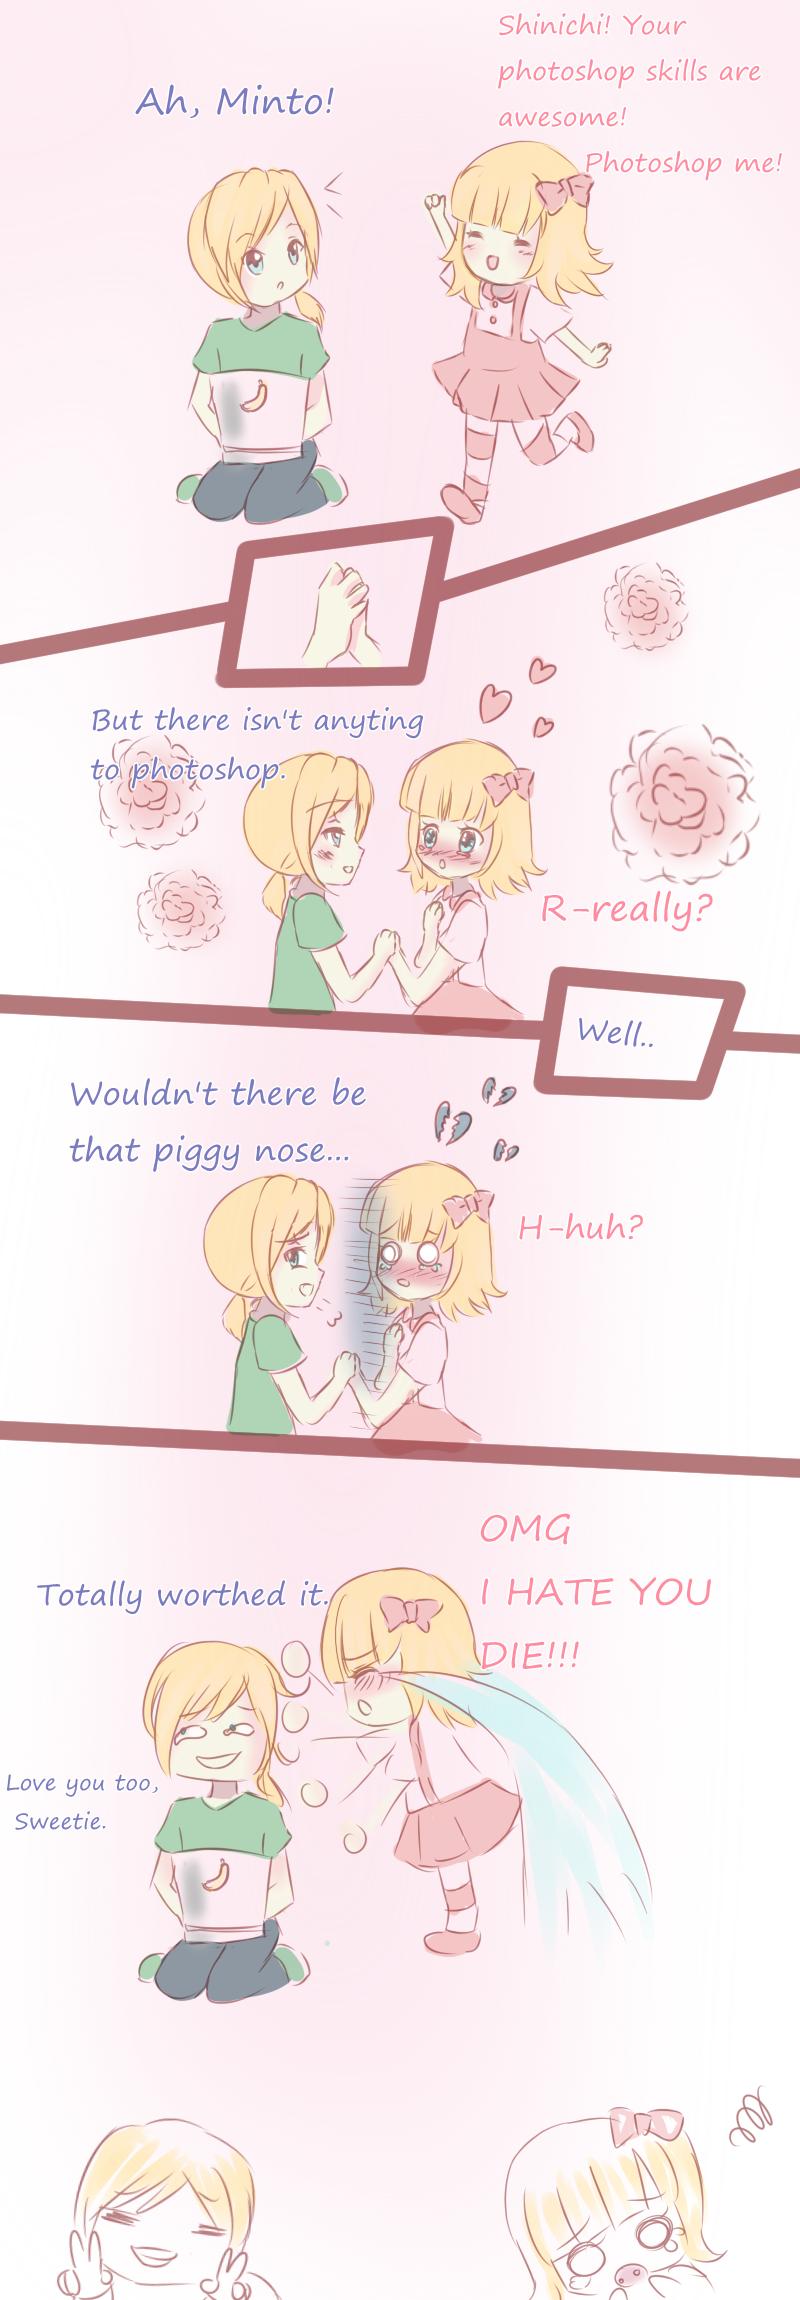 Funny Chibi Shinichi and Minto Comic by Luumies